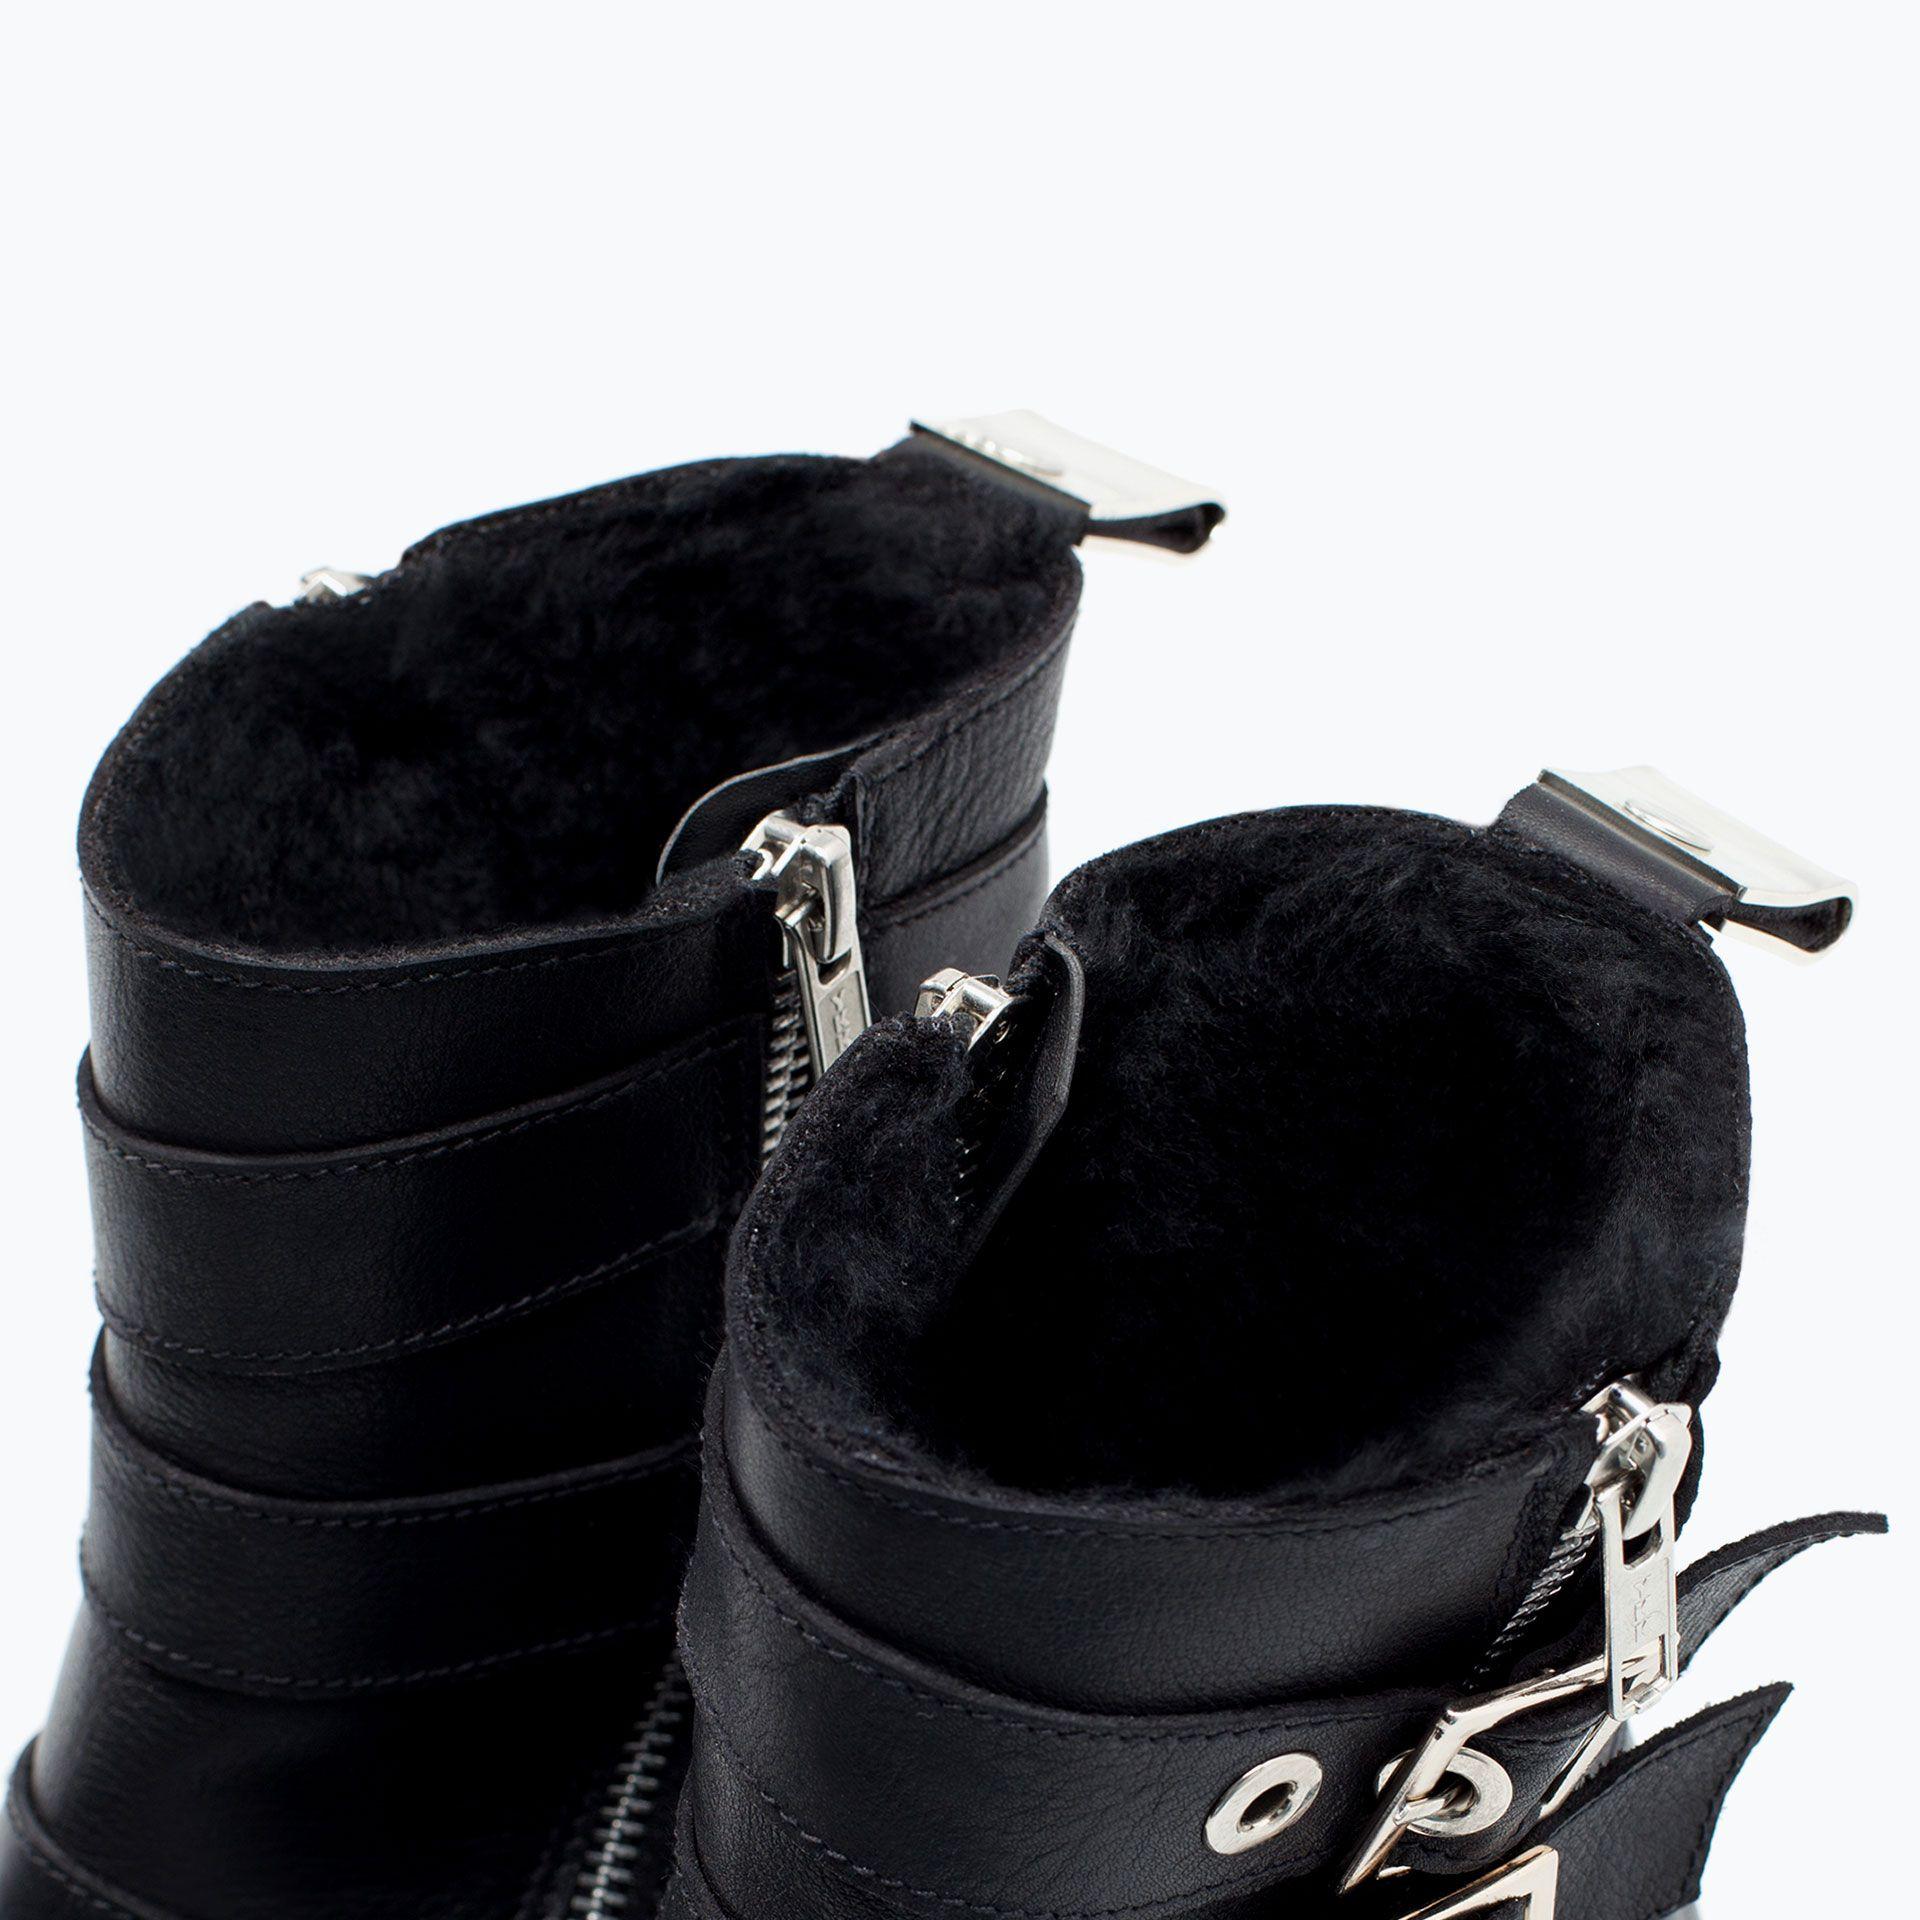 Zara Boots Motard Cuir Doublure Fourree 72 Acrylique 15